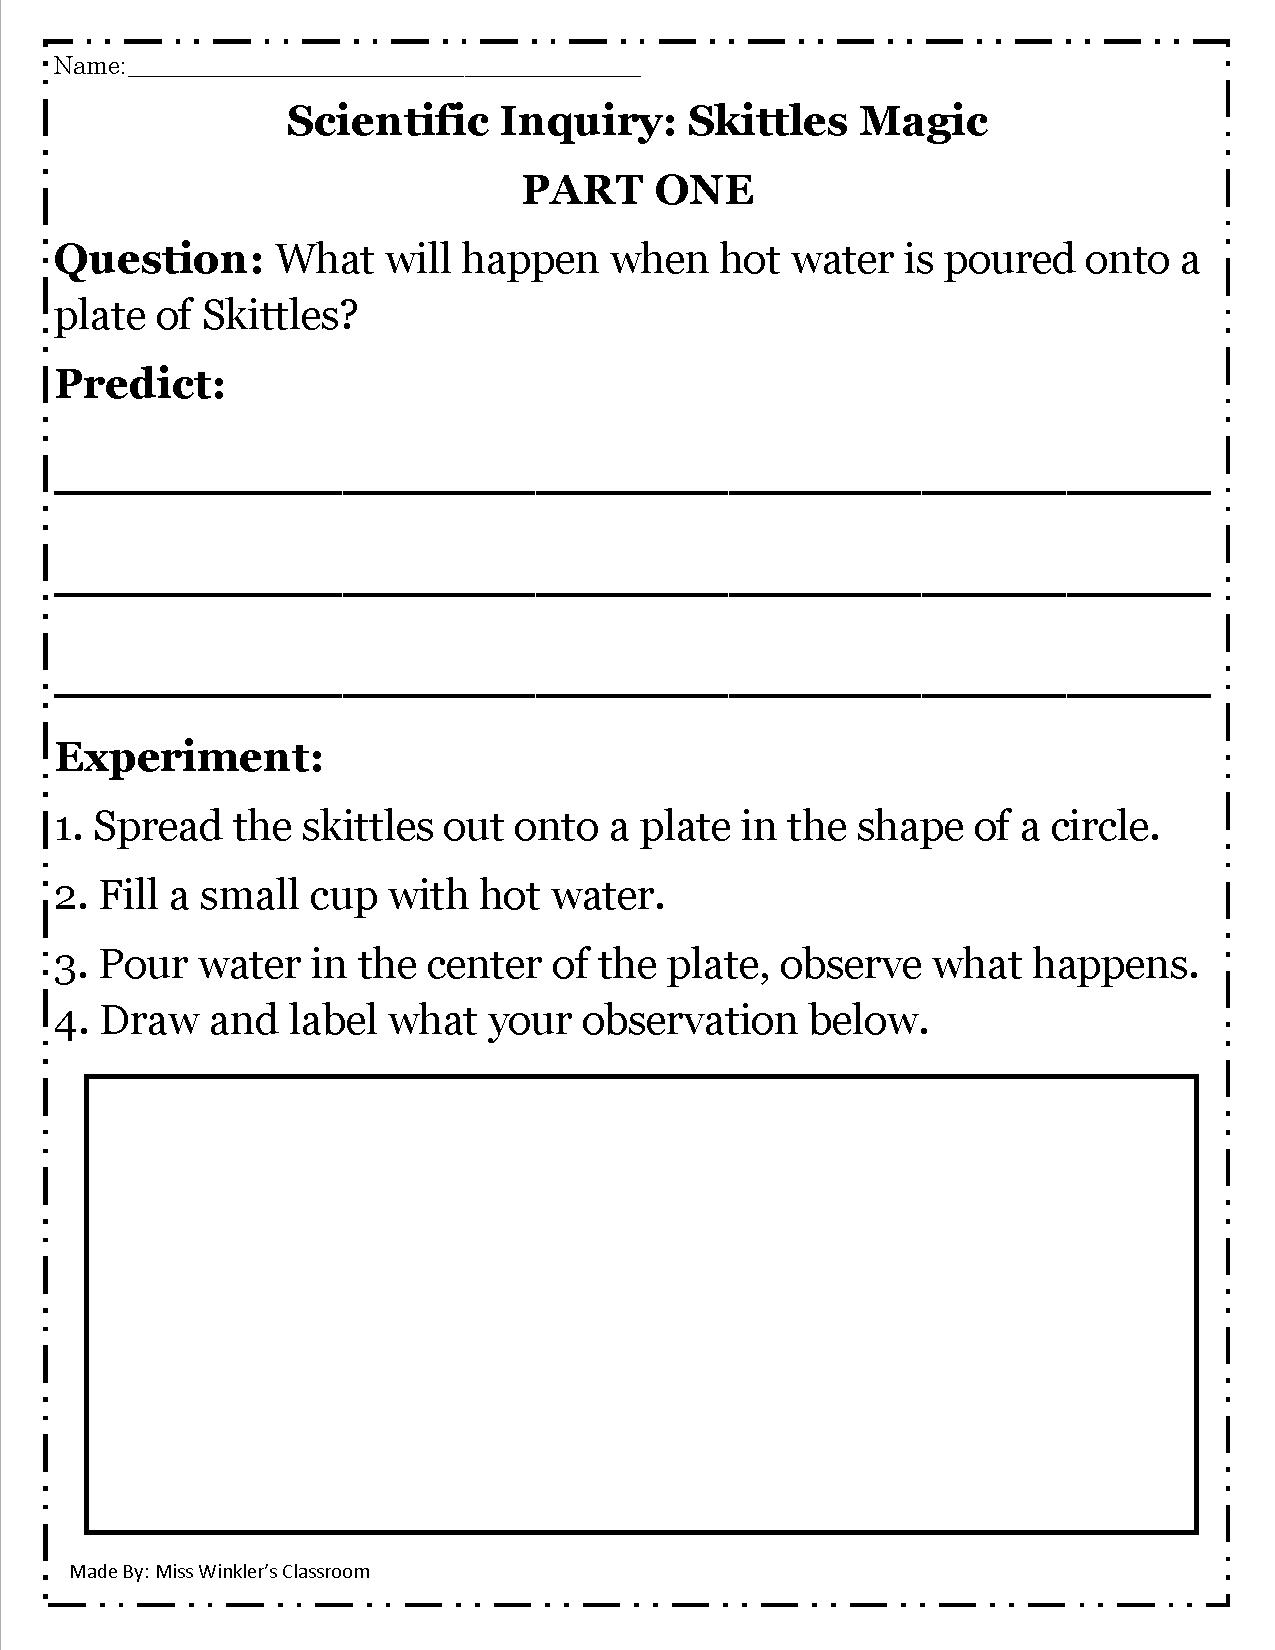 Scientific Inquiry Skittles Magic Single Page